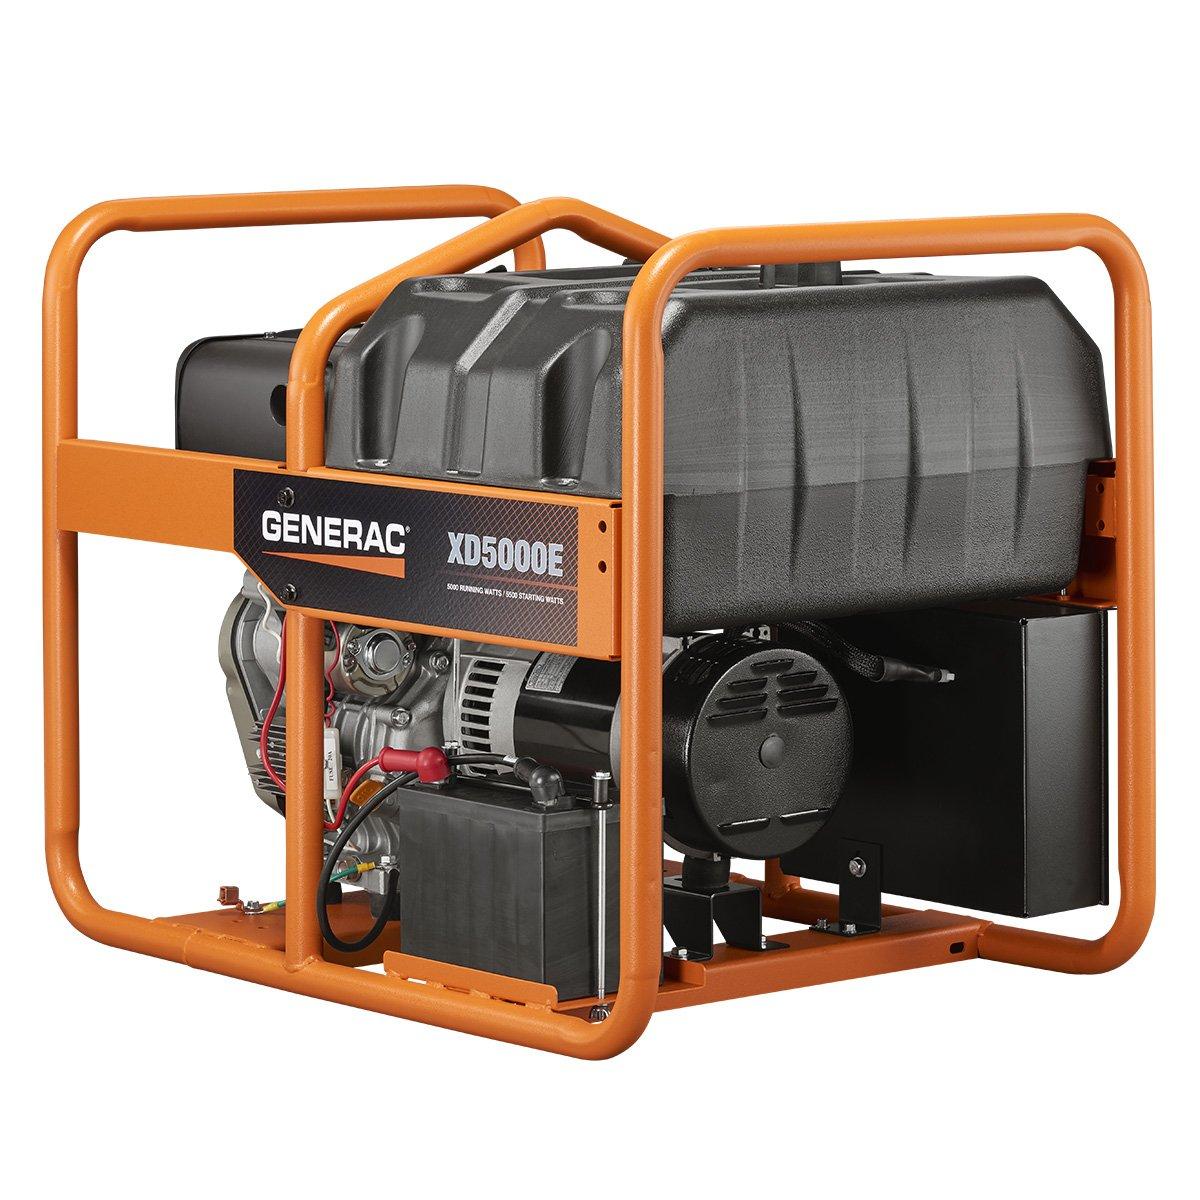 Amazon.com : Generac 6864, 5000 Running Watts/5500 Starting Watts, Diesel  Powered Portable Generator : Garden & Outdoor